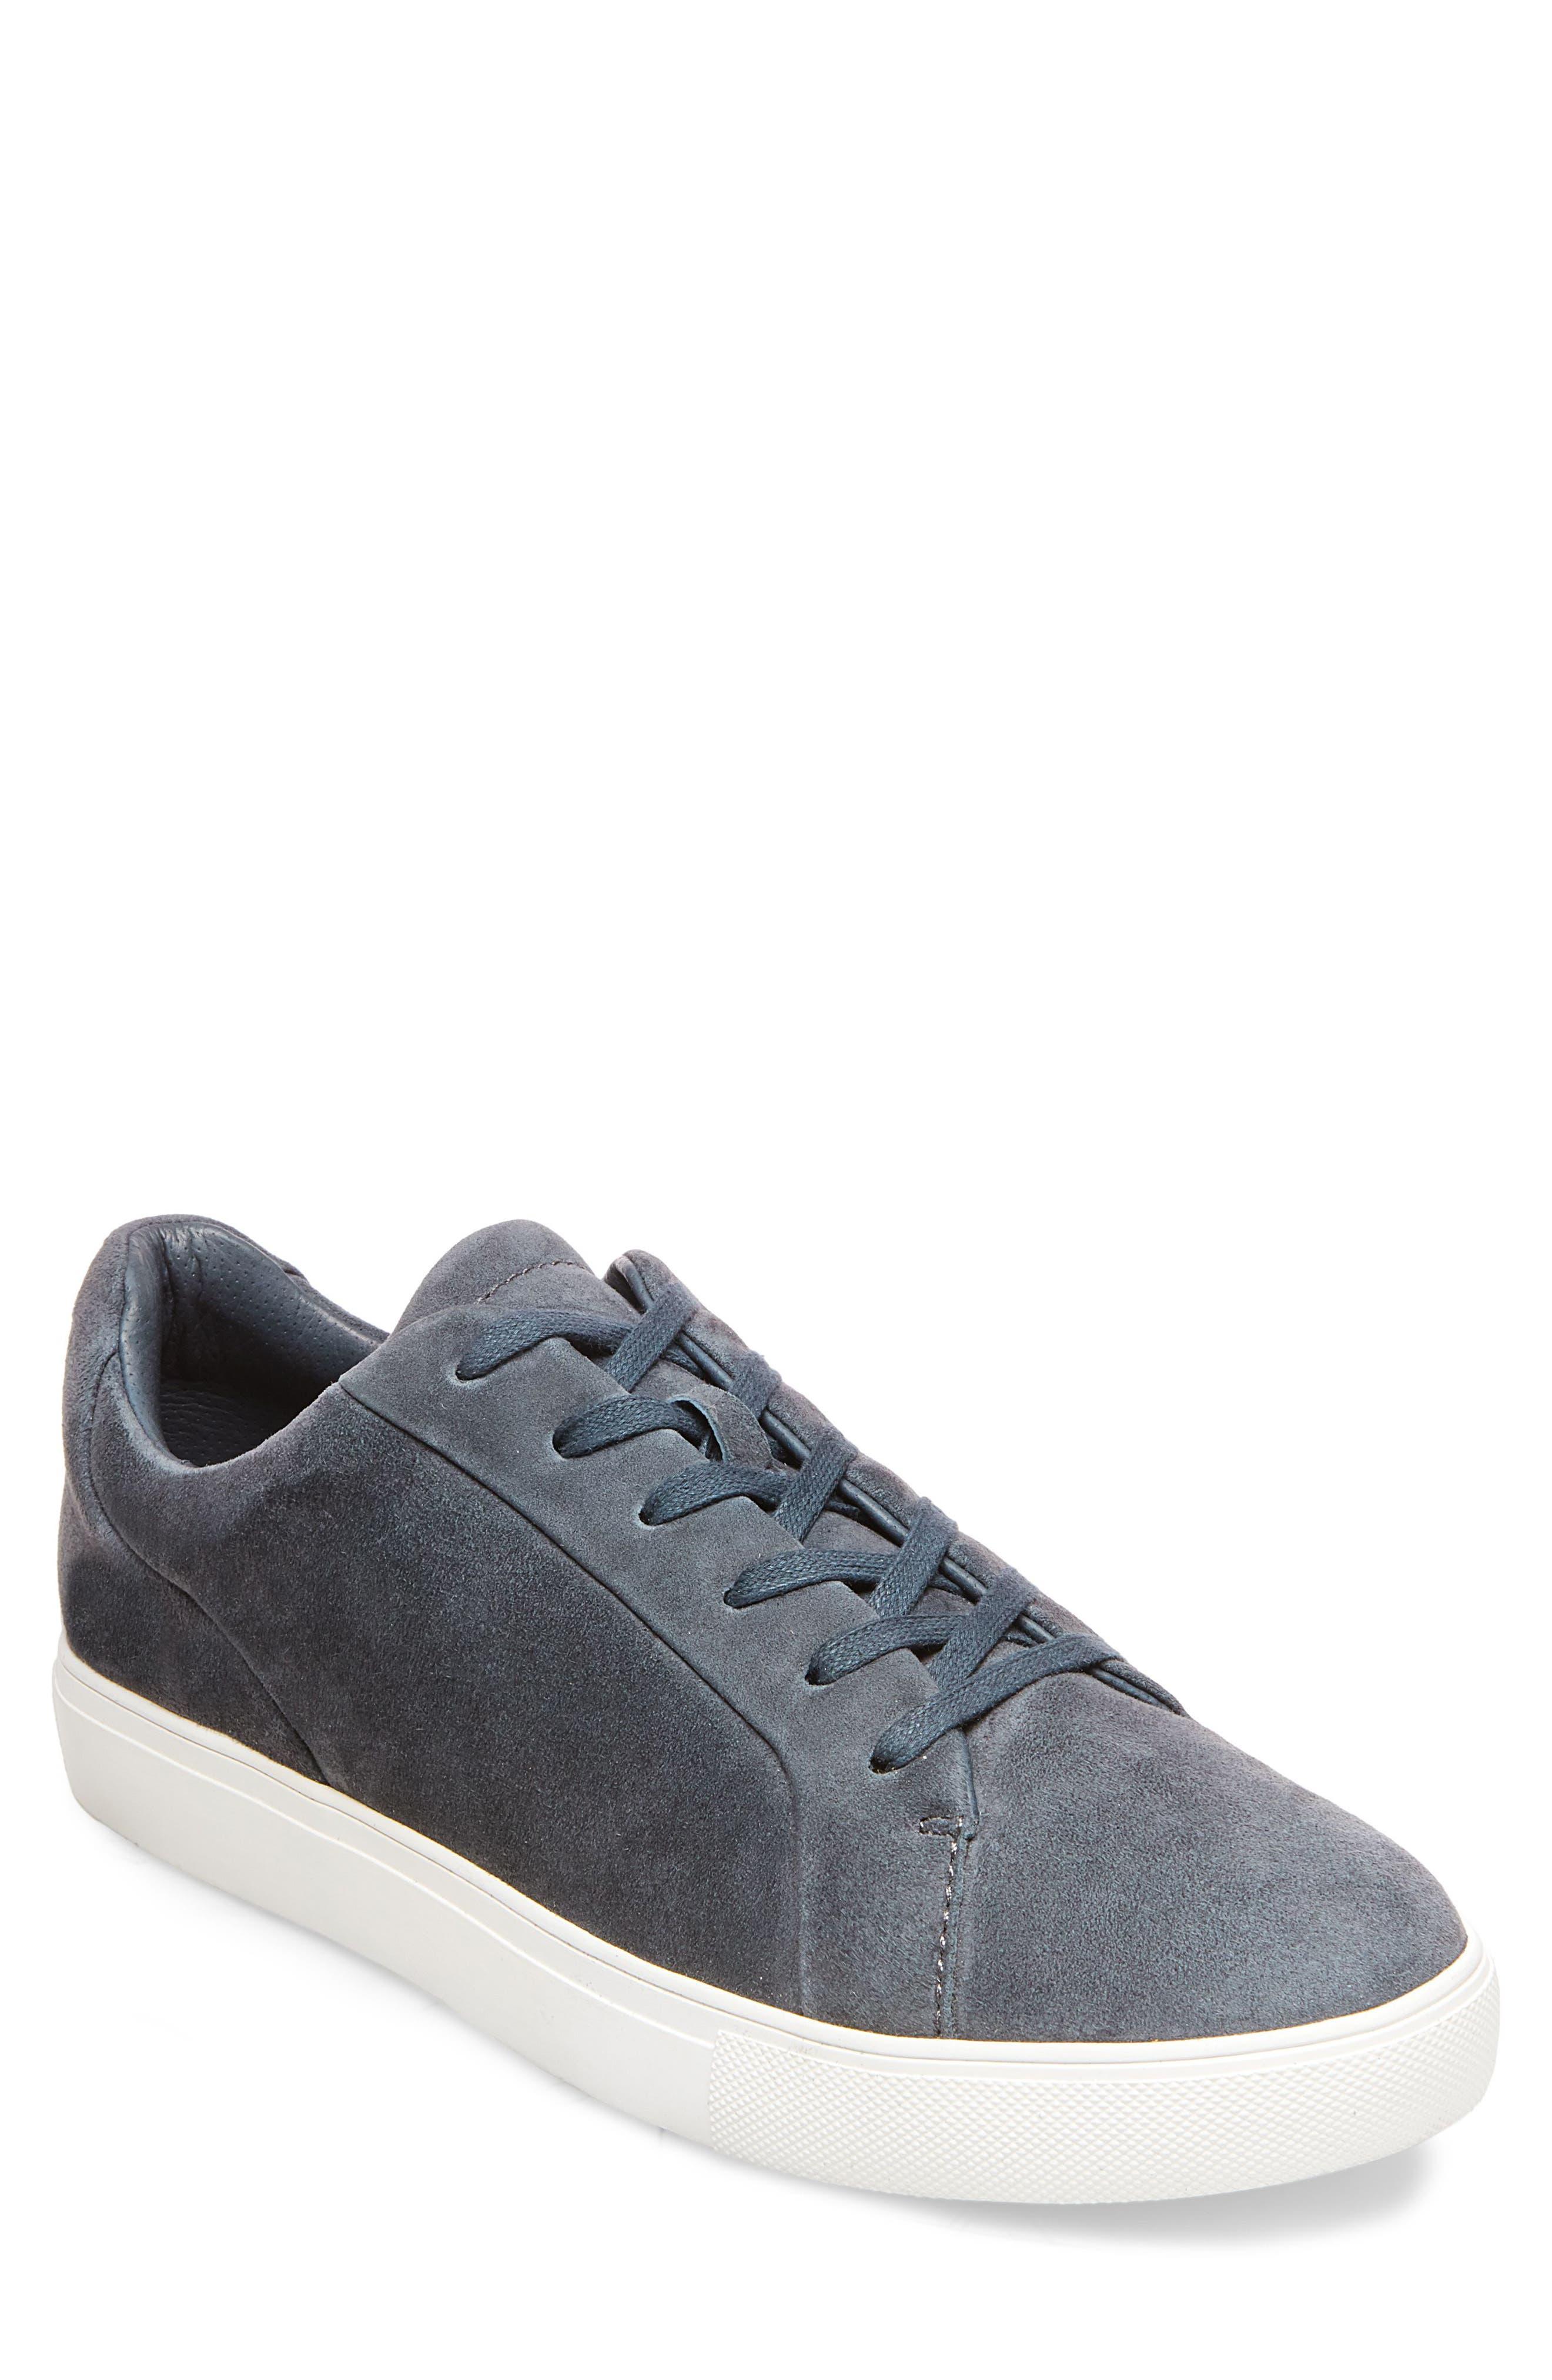 x GQ James Sneaker,                             Main thumbnail 1, color,                             020